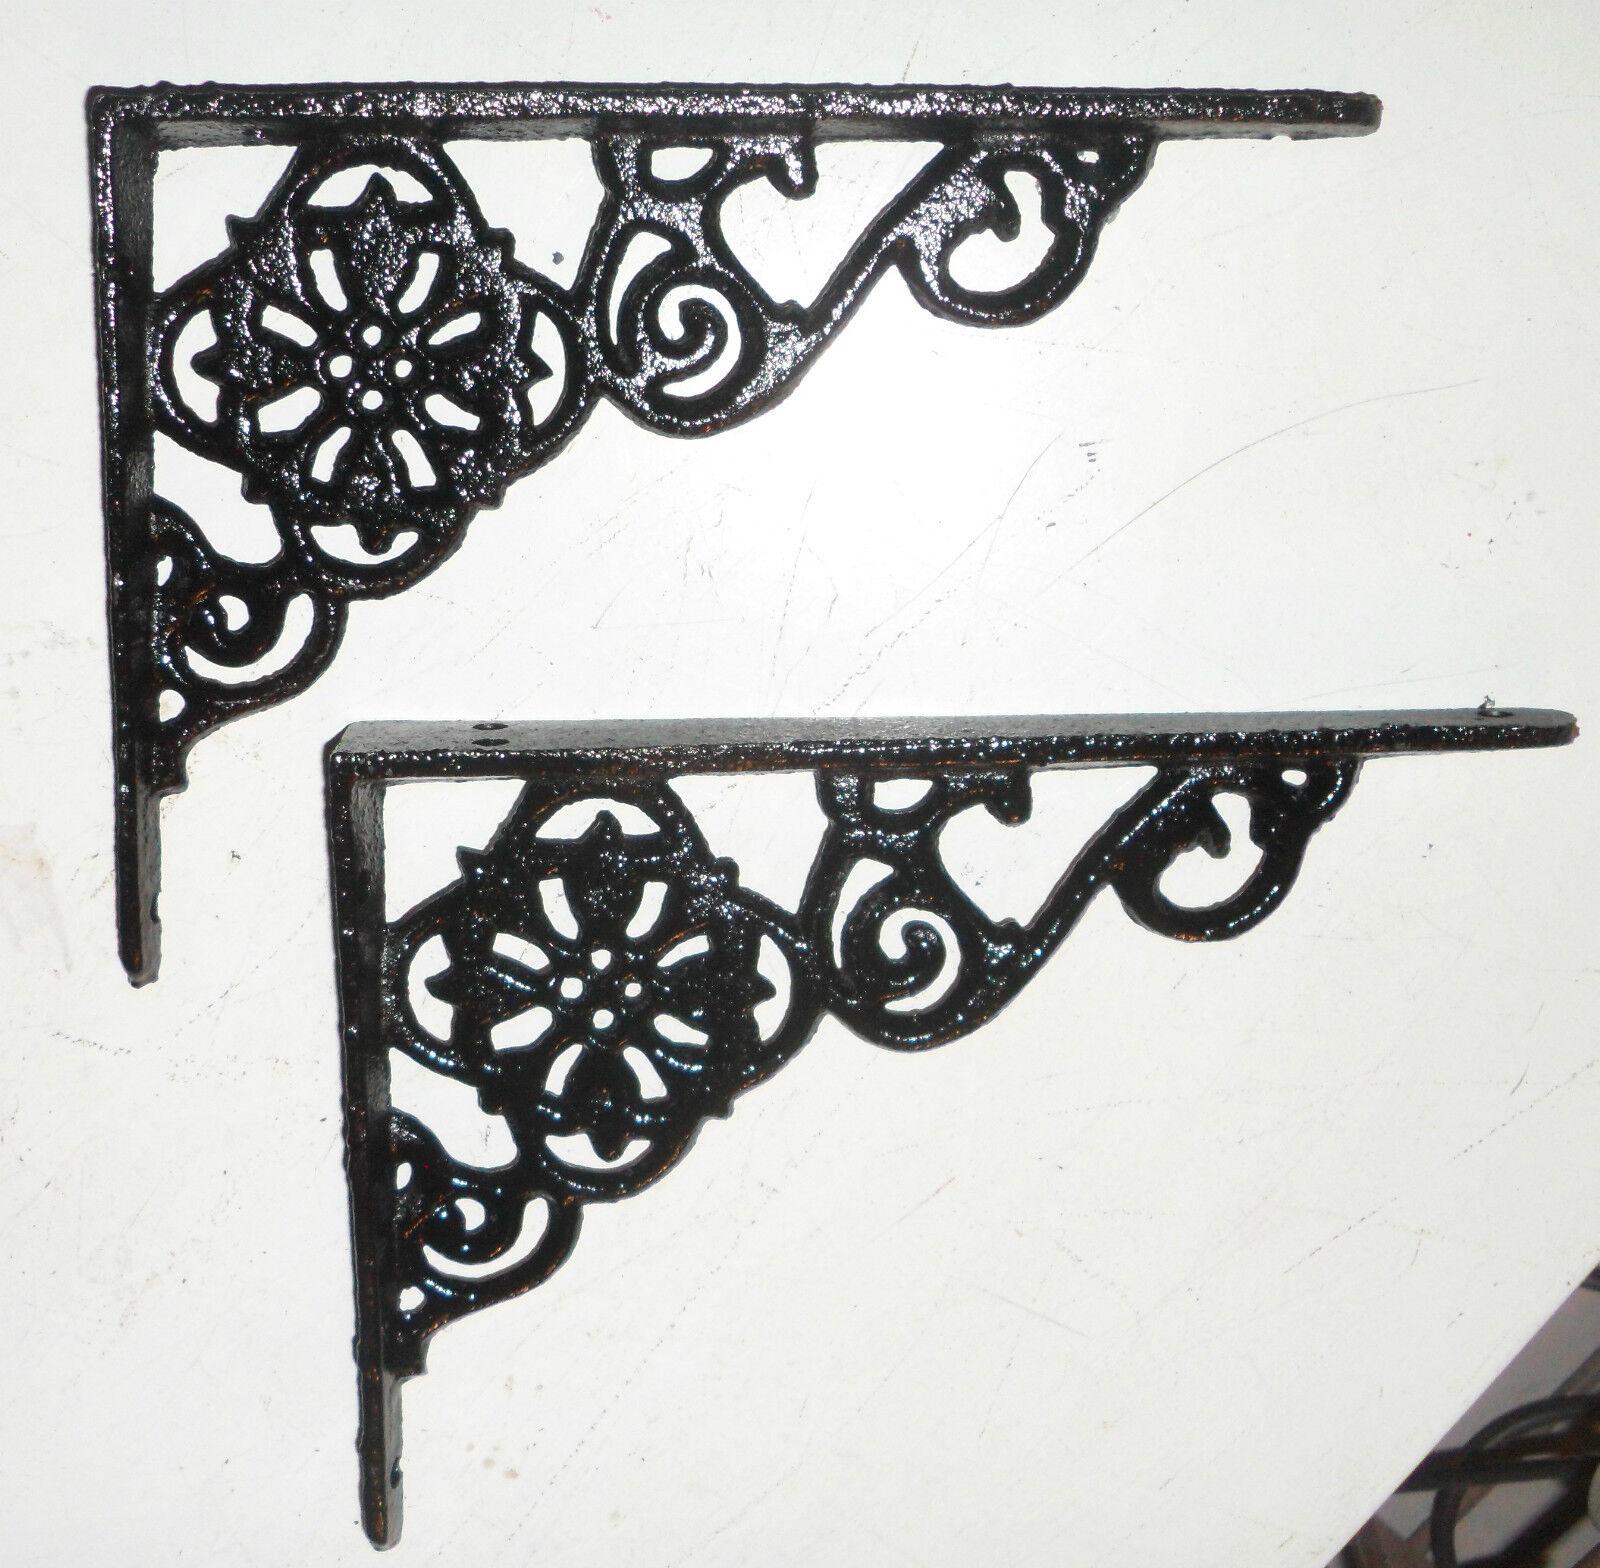 rustic mounting wall shelves shelving decorative bracket shelf for design brackets iron awesome ornate